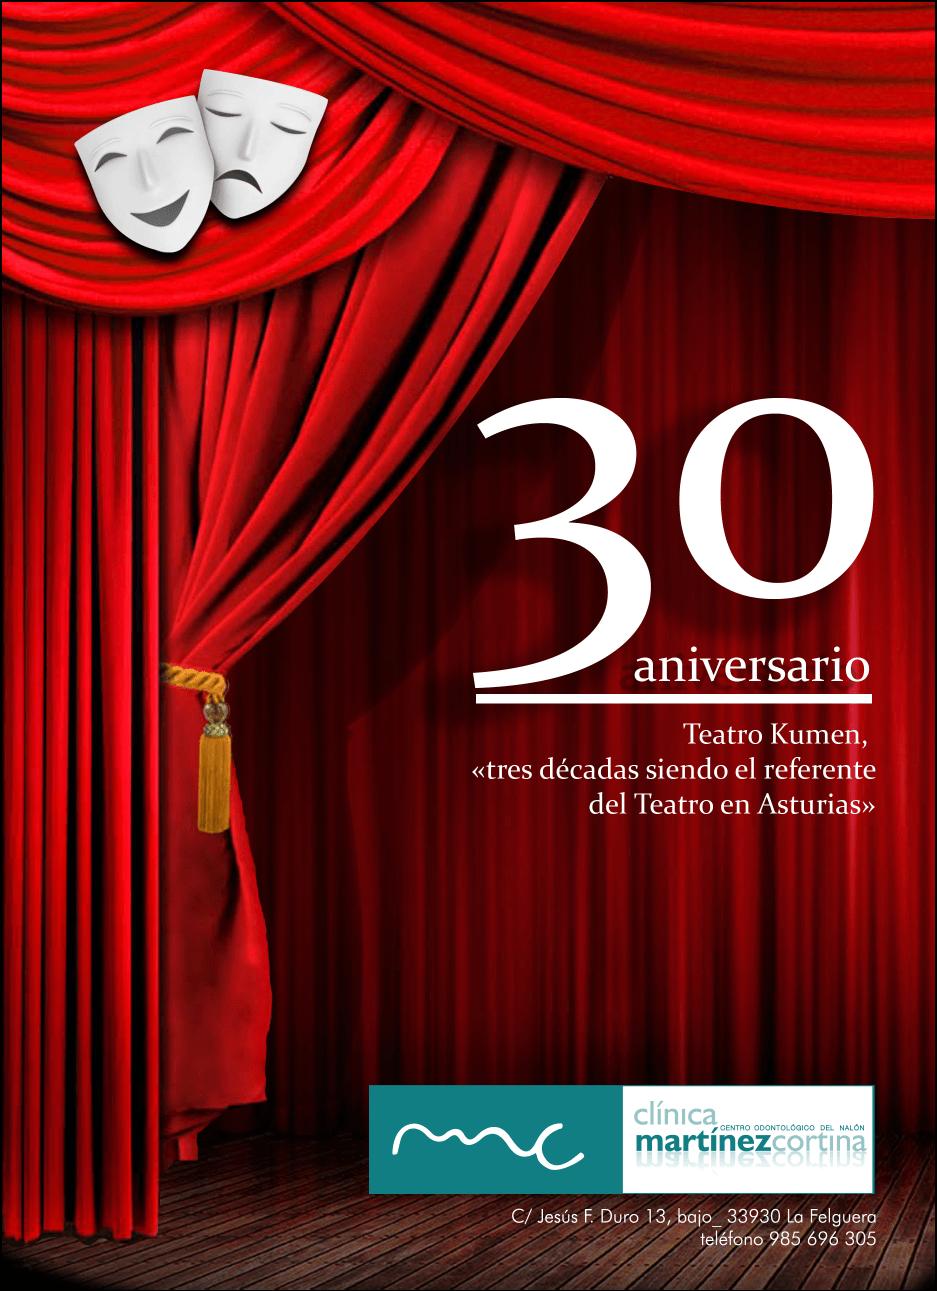 Teatro Kumen  Llana Publicidad